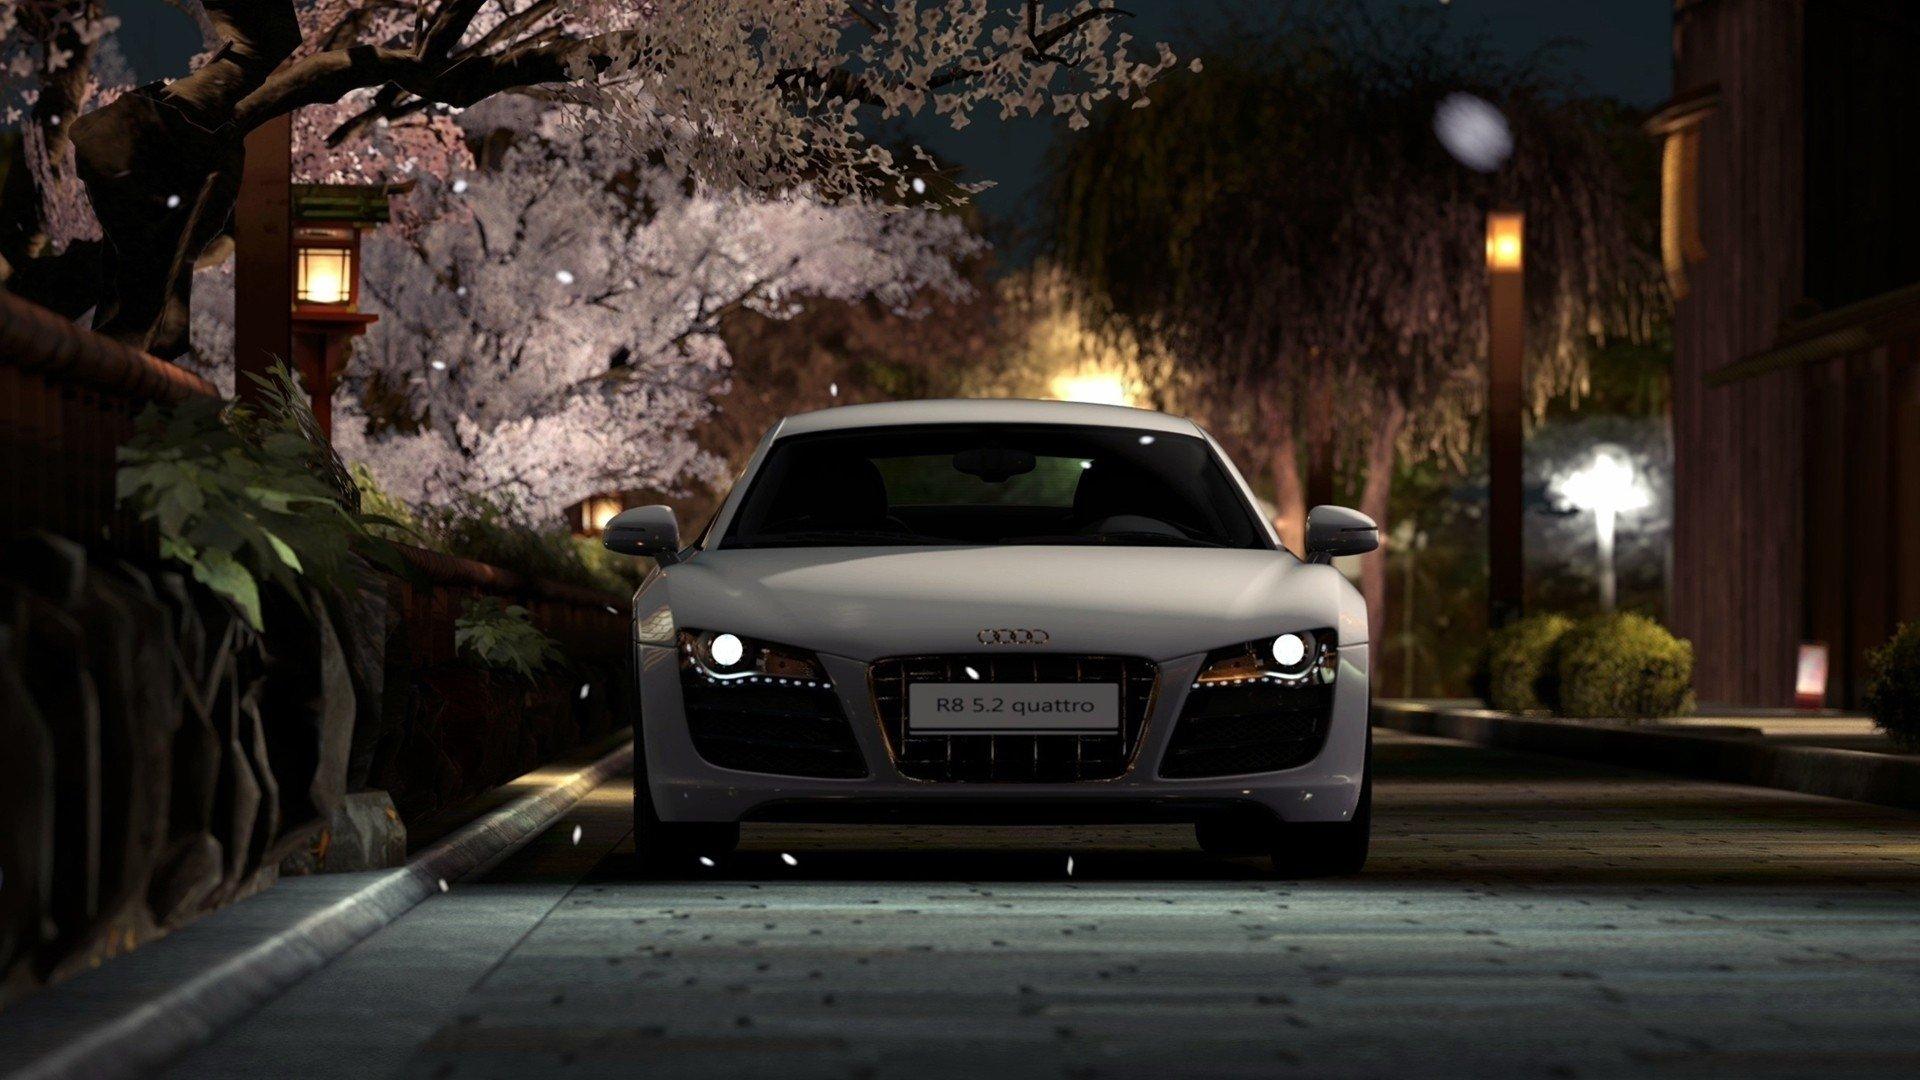 Cars Hd Wallpapers 1080p Lamborghini Audi R8 Hd Wallpaper Background Image 1920x1080 Id